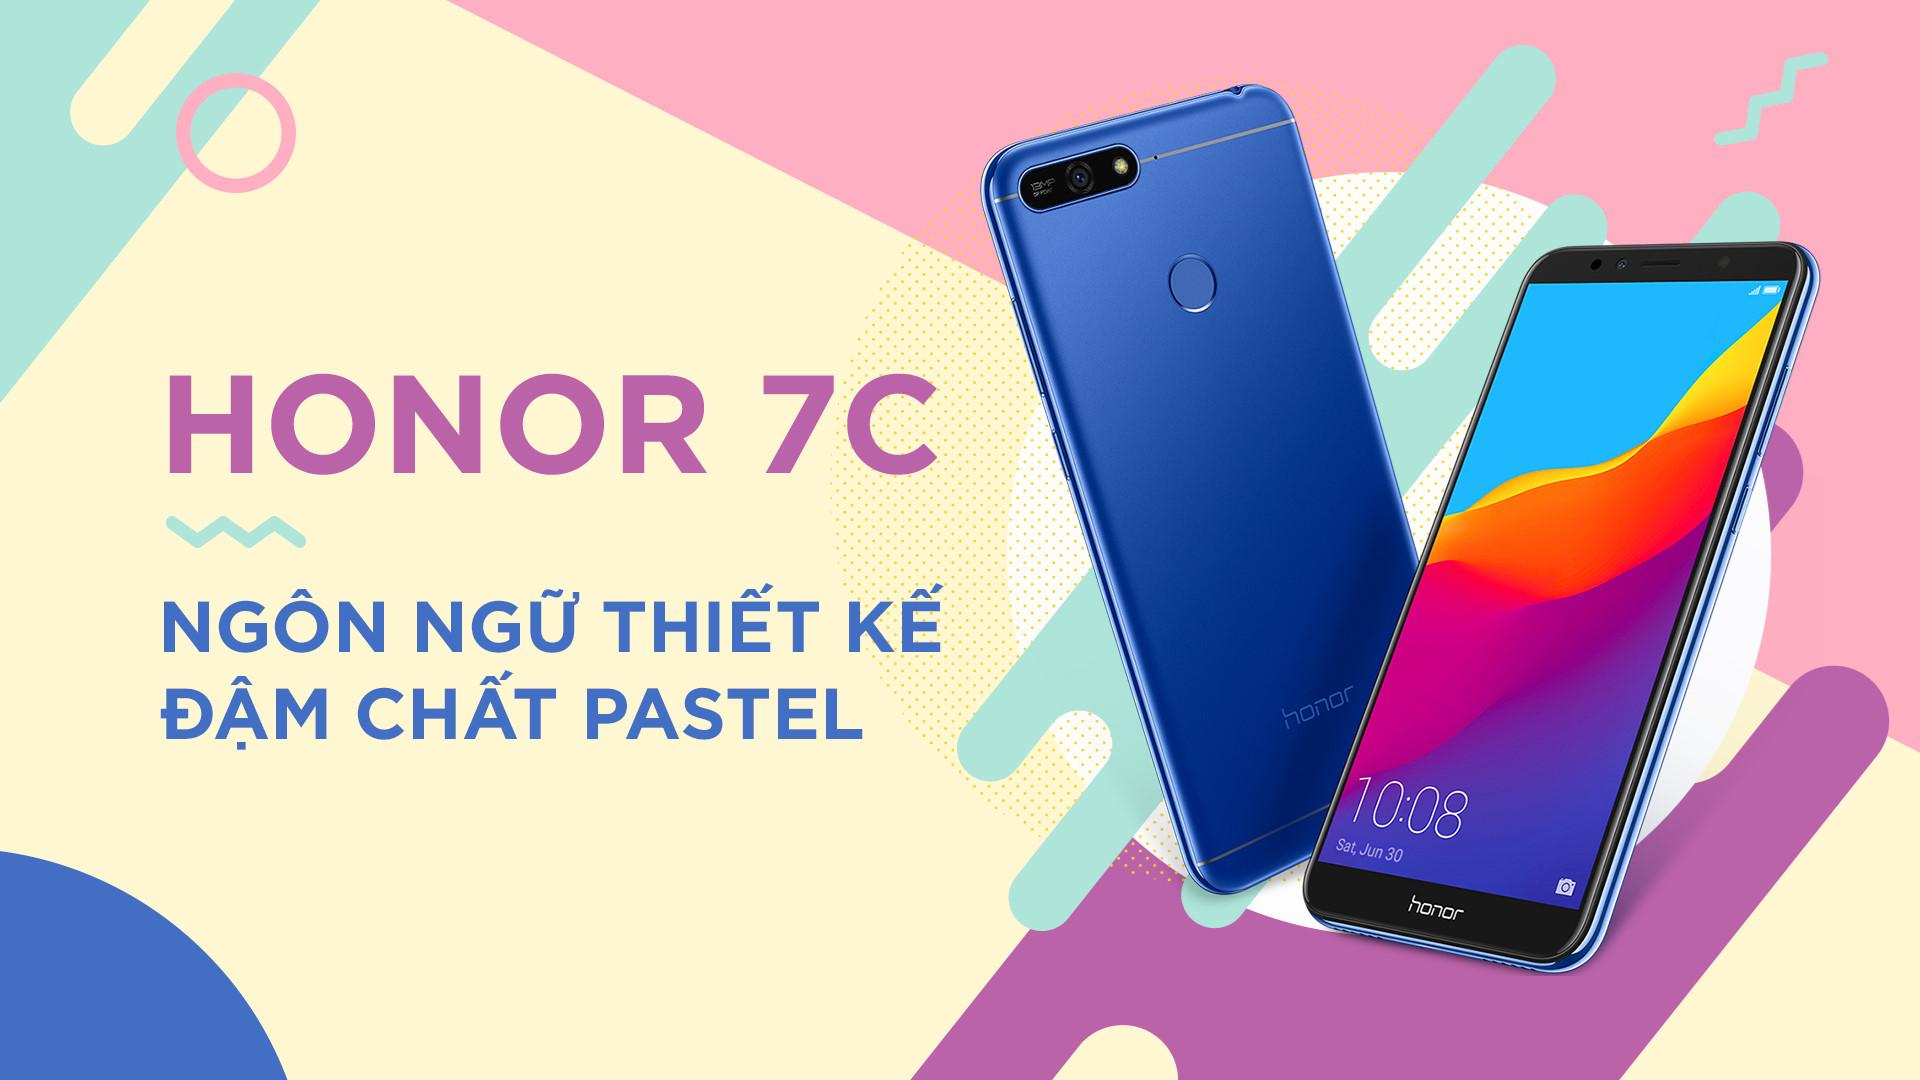 Honor 7C: Ngon ngu thiết kế dam chat pastel hinh anh 2